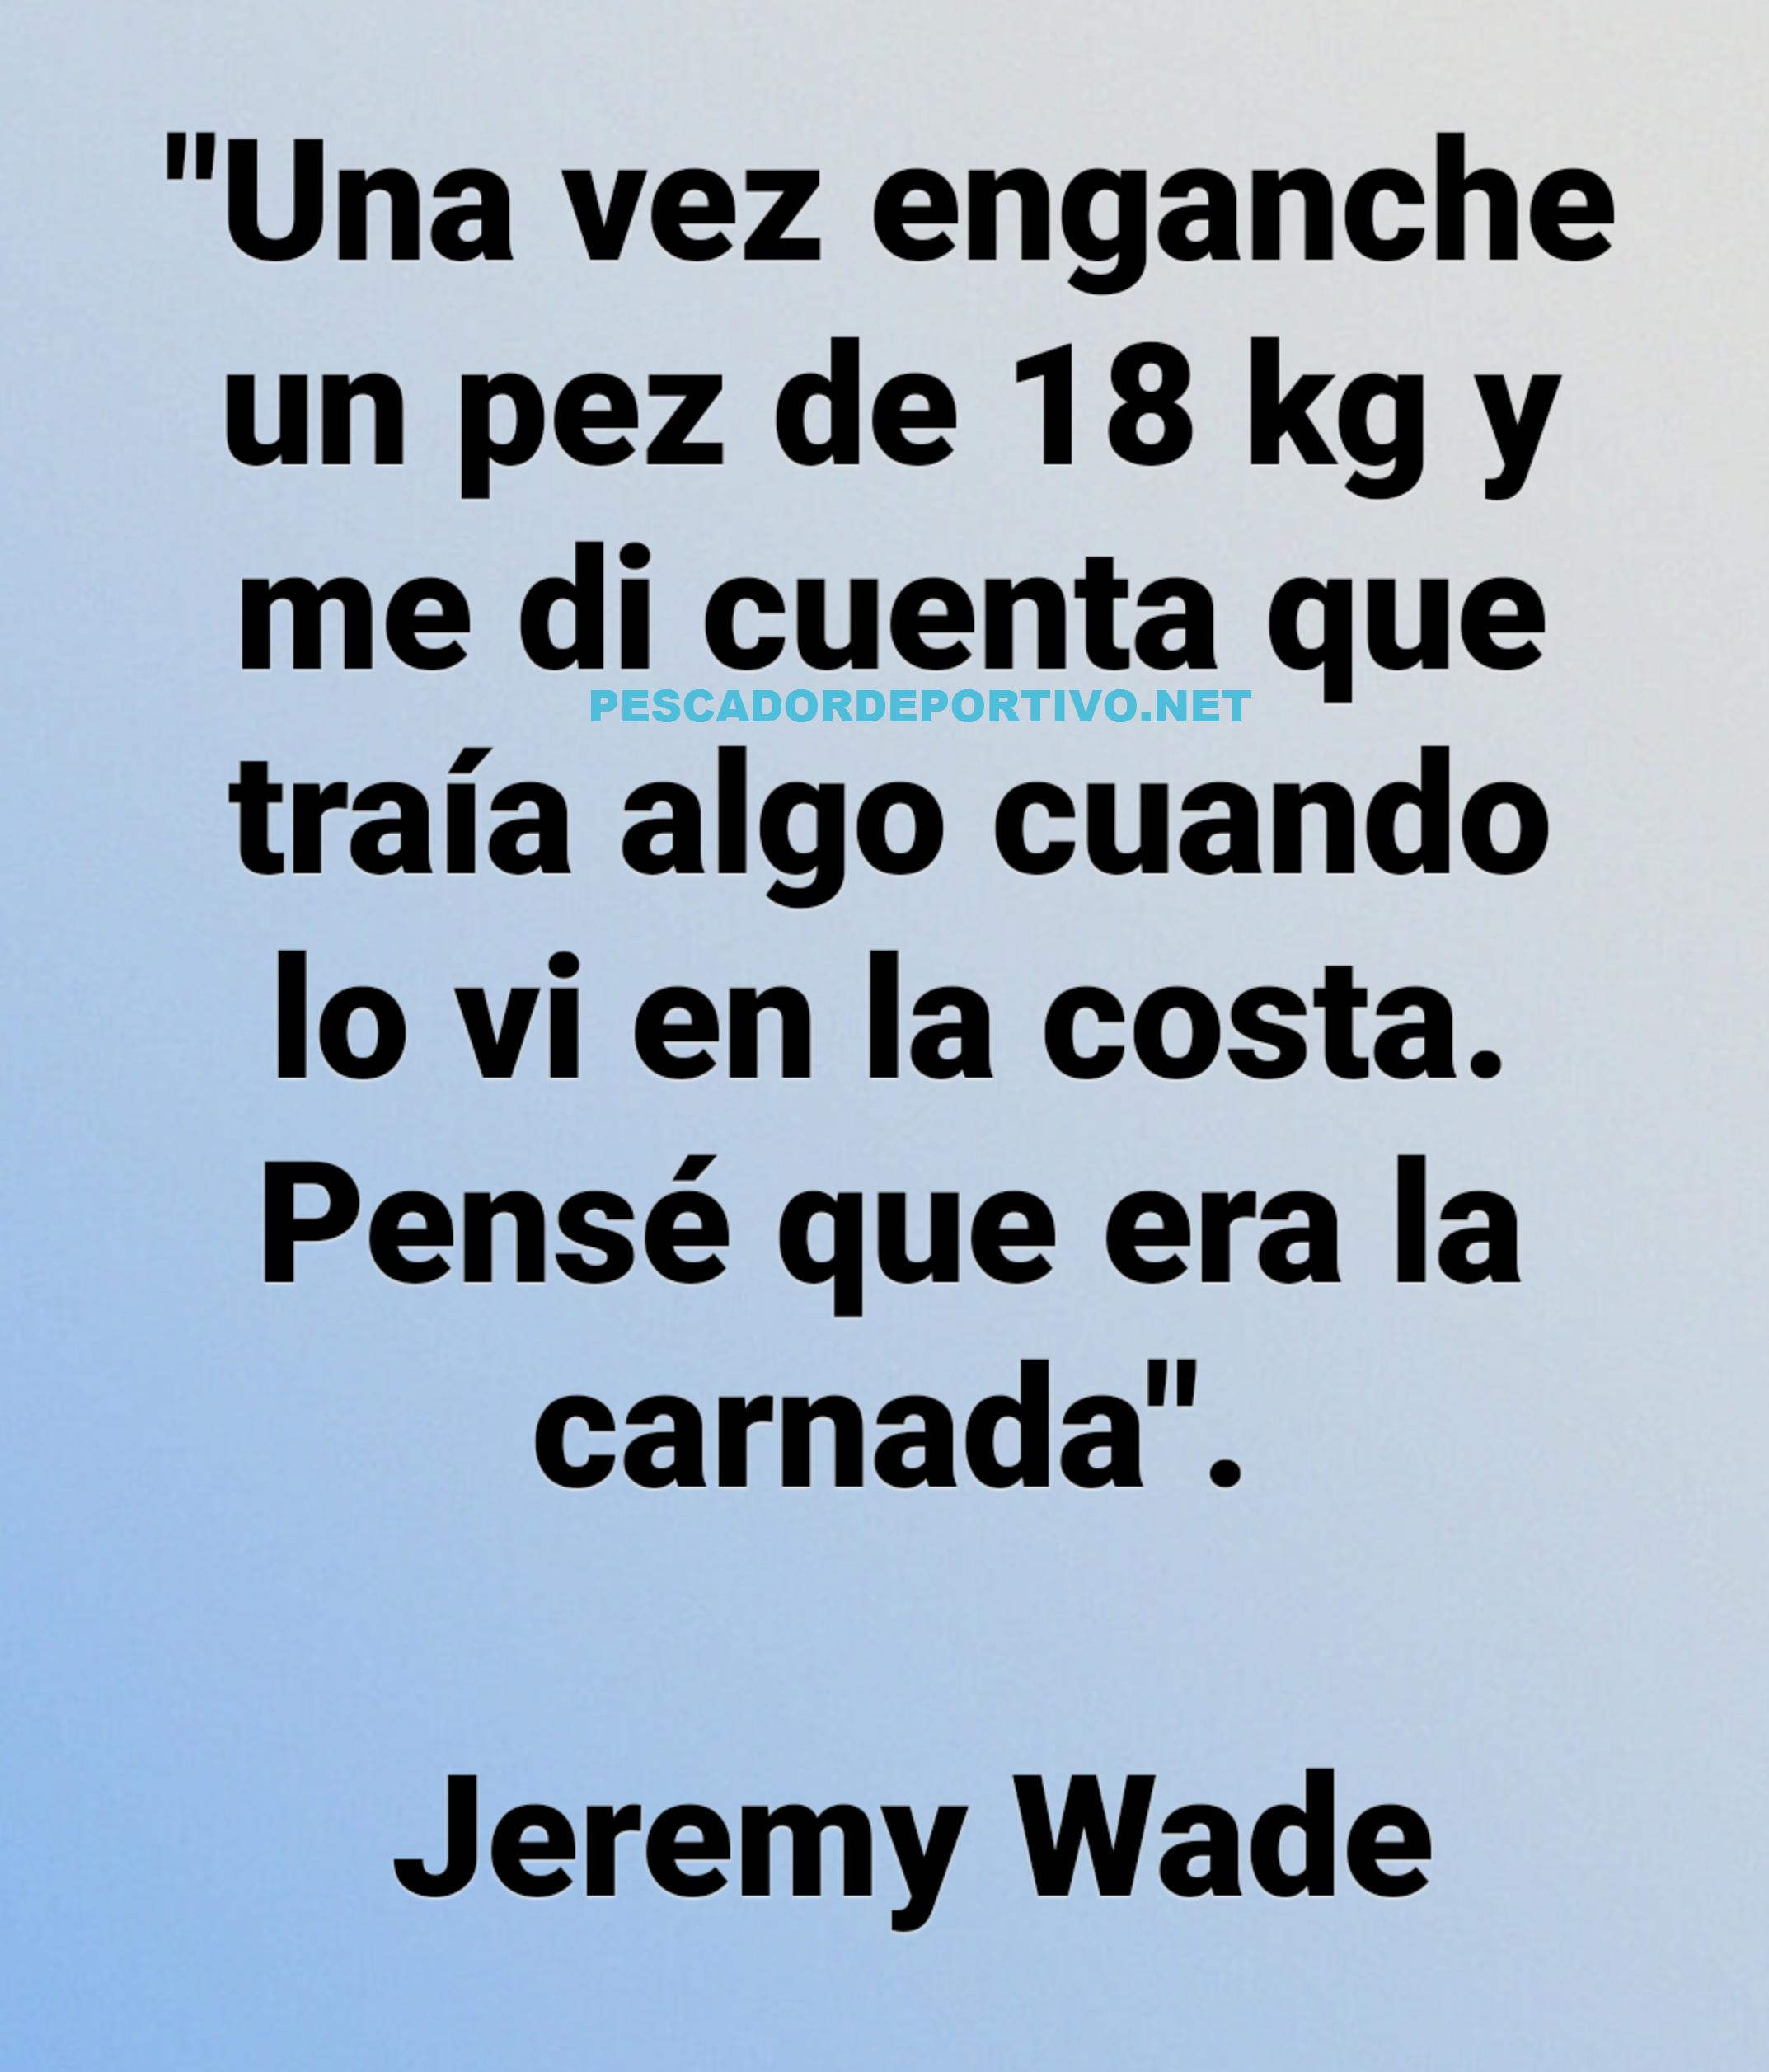 Meme Jeremy Wade 10